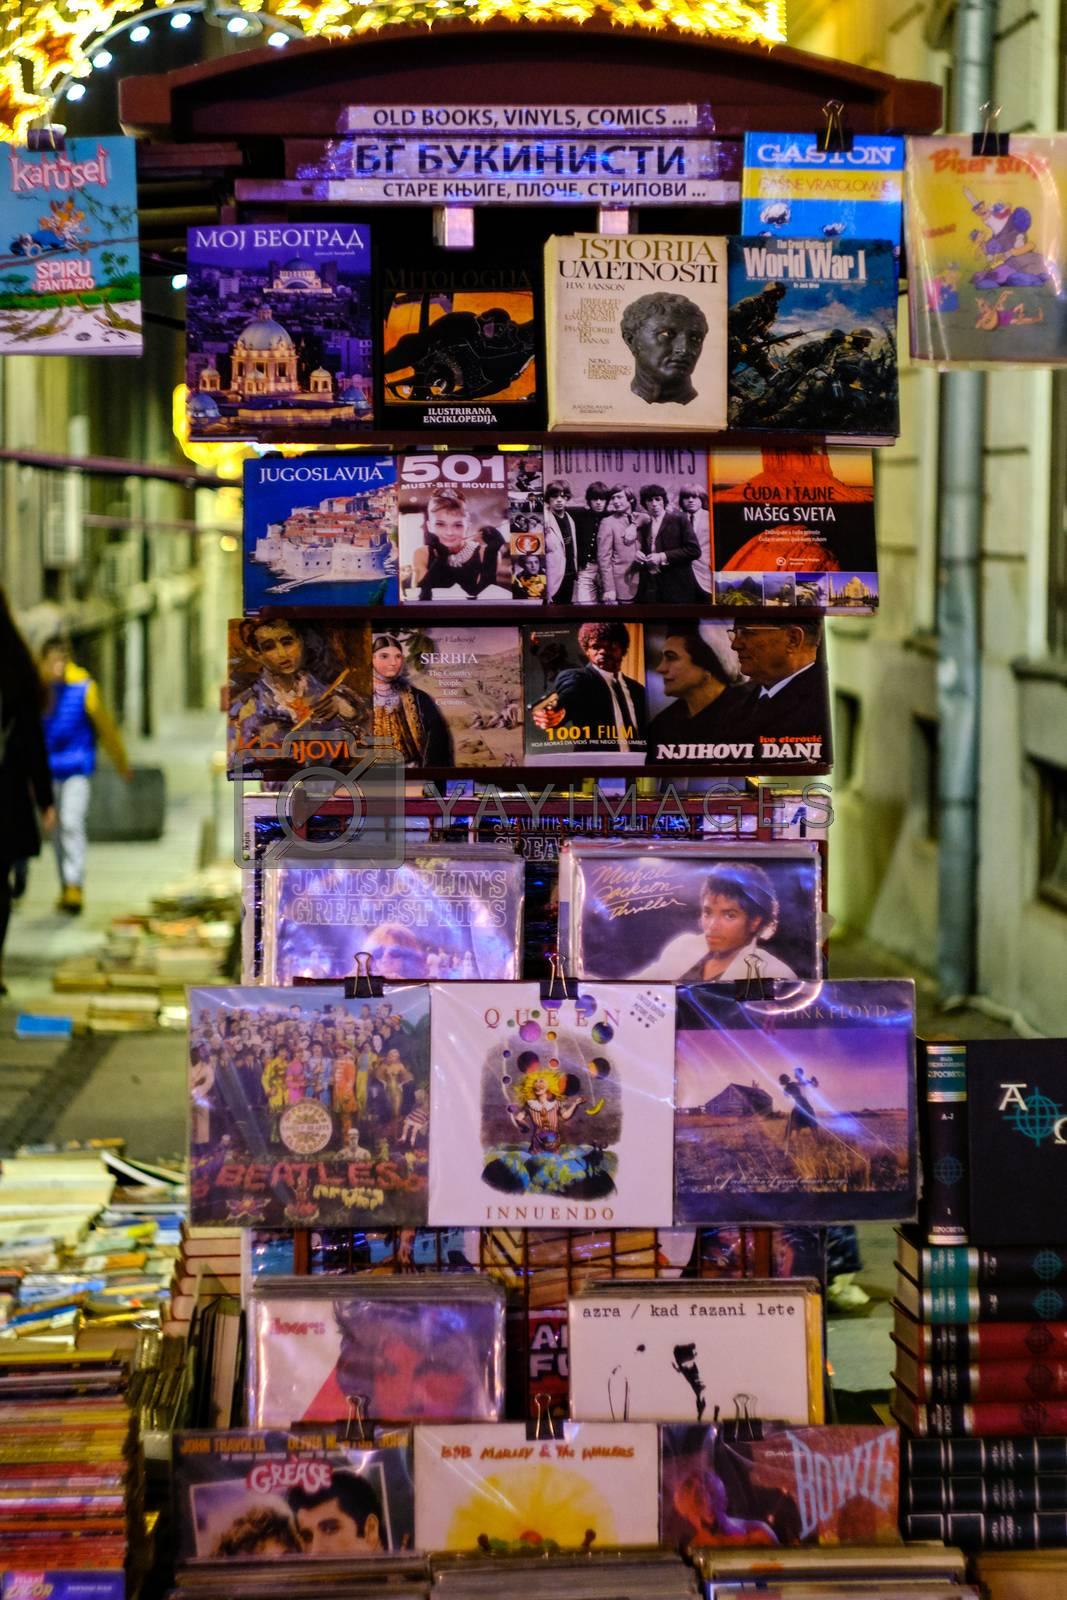 Belgrade / Serbia - December 15, 2019: Second-hand books and LP records street stall in pedestrian Knez Mihailova street in Belgrade, Serbia